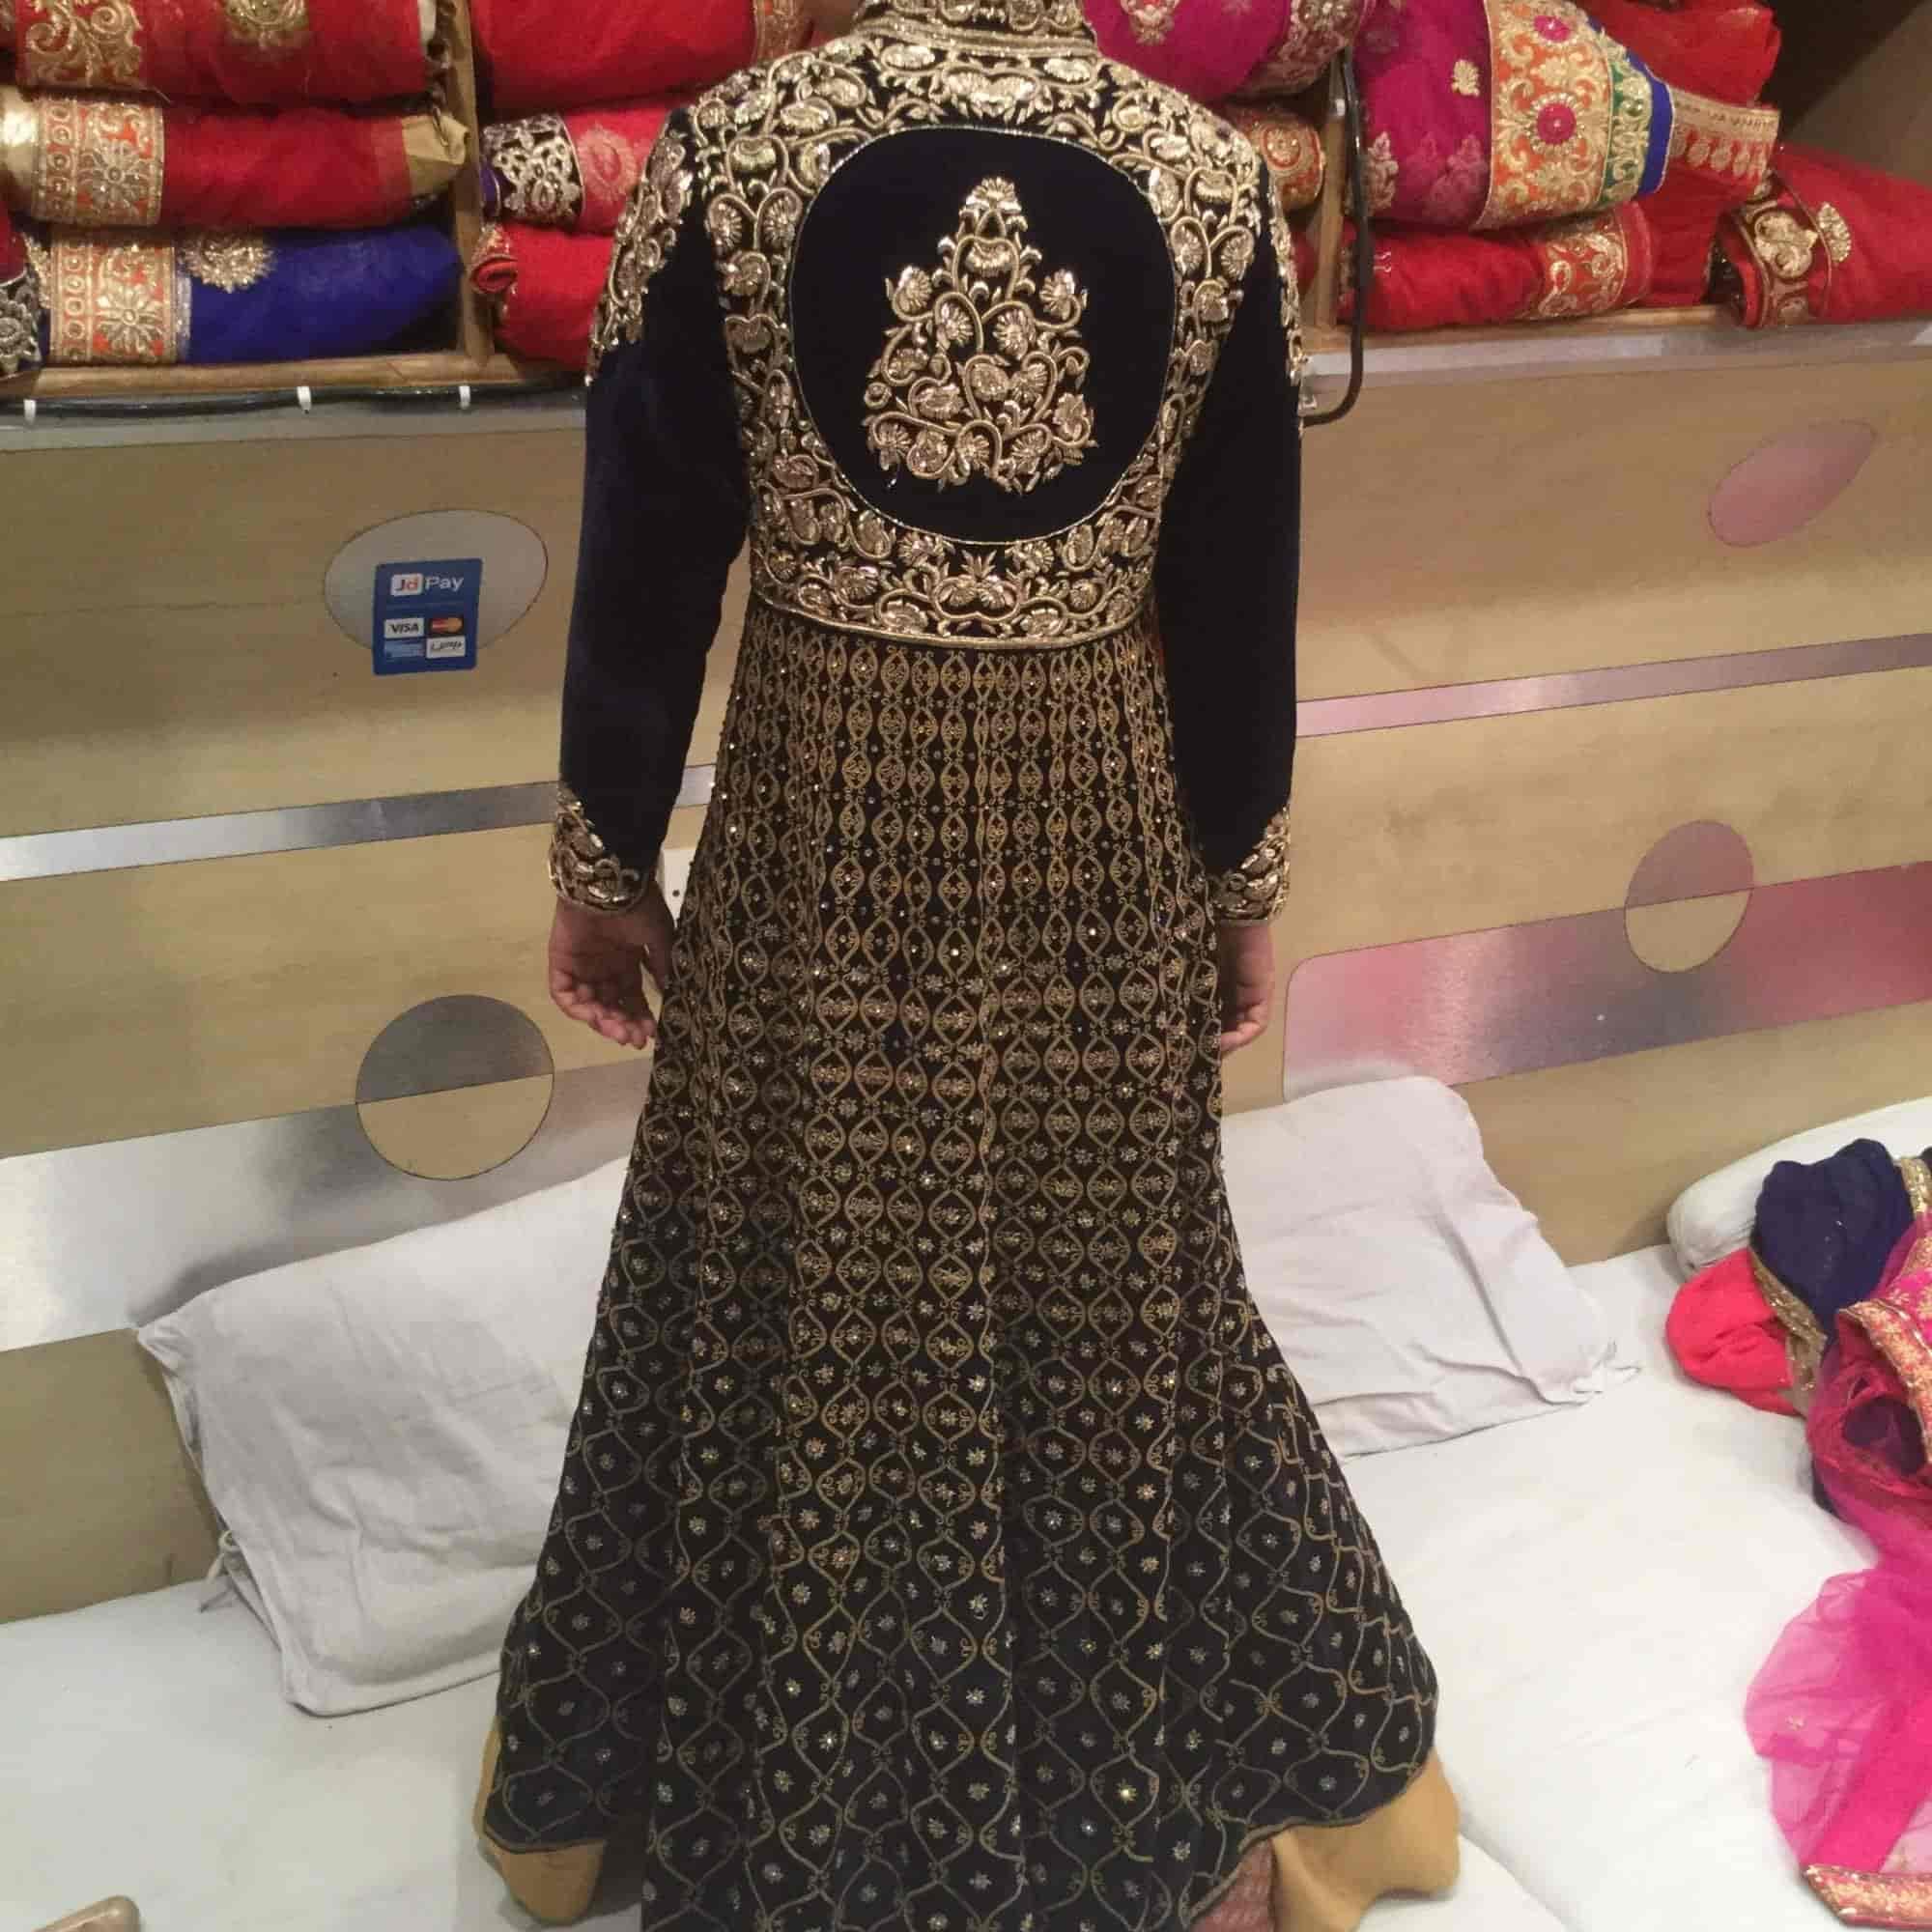 2a9effc389 Kala Niketan designer, Chandni Chowk - Saree Retailers in Delhi - Justdial